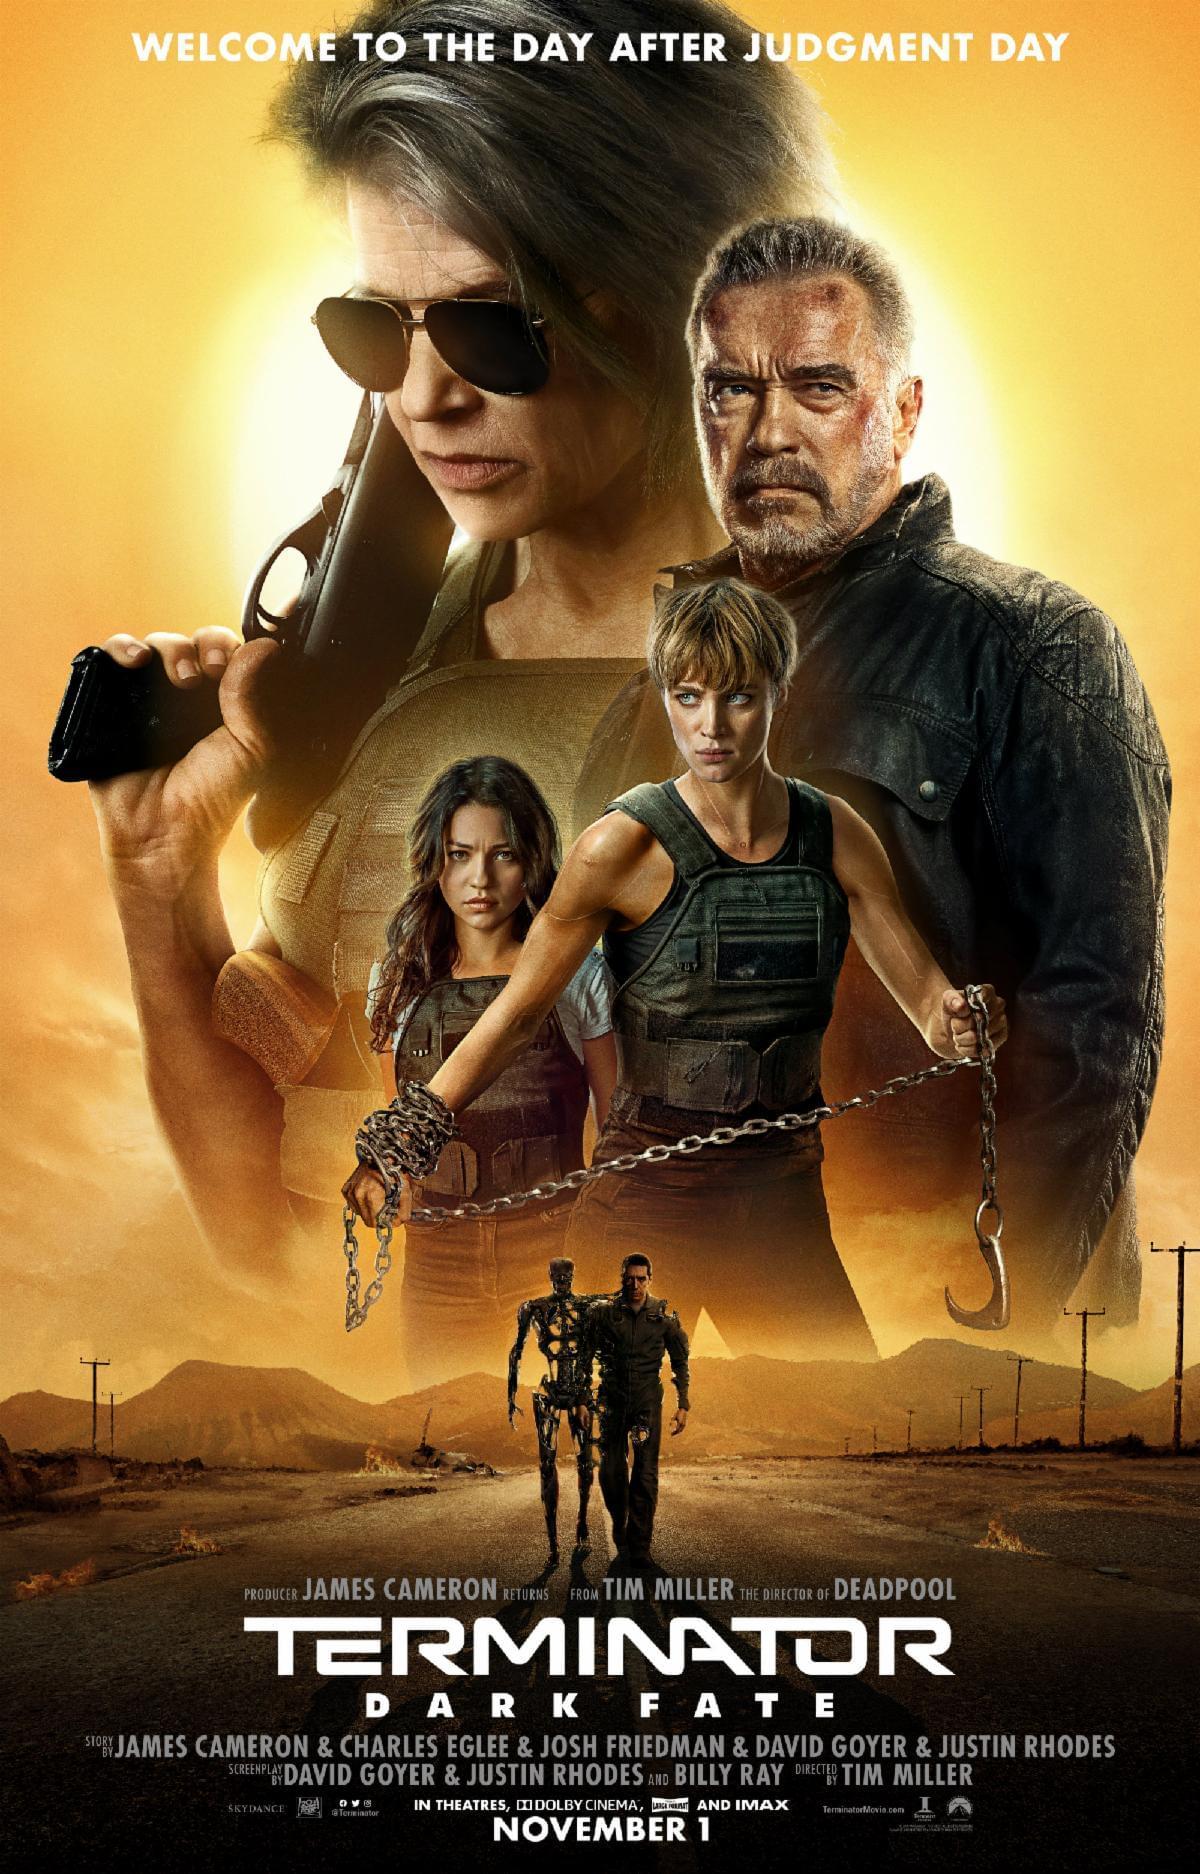 Win tickets to the 95.9 The FOX screening of 'Terminator: Dark Fate'